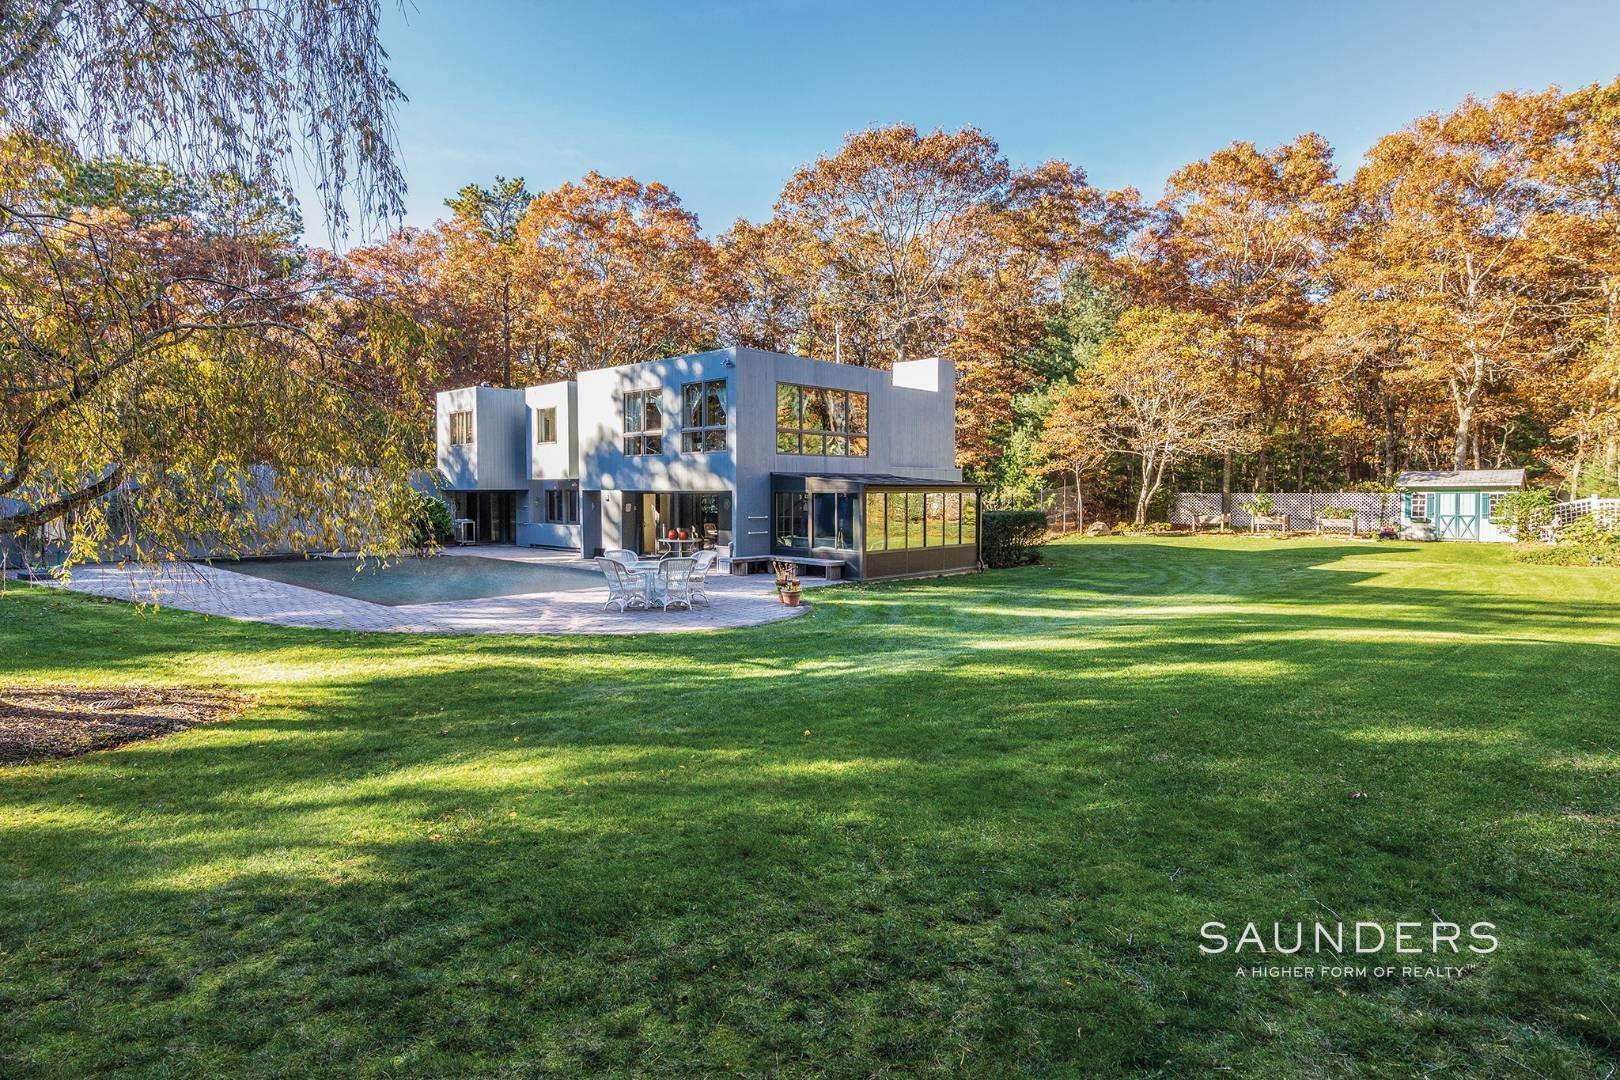 Single Family Homes at East Hampton, East Hampton Town, NY 11937